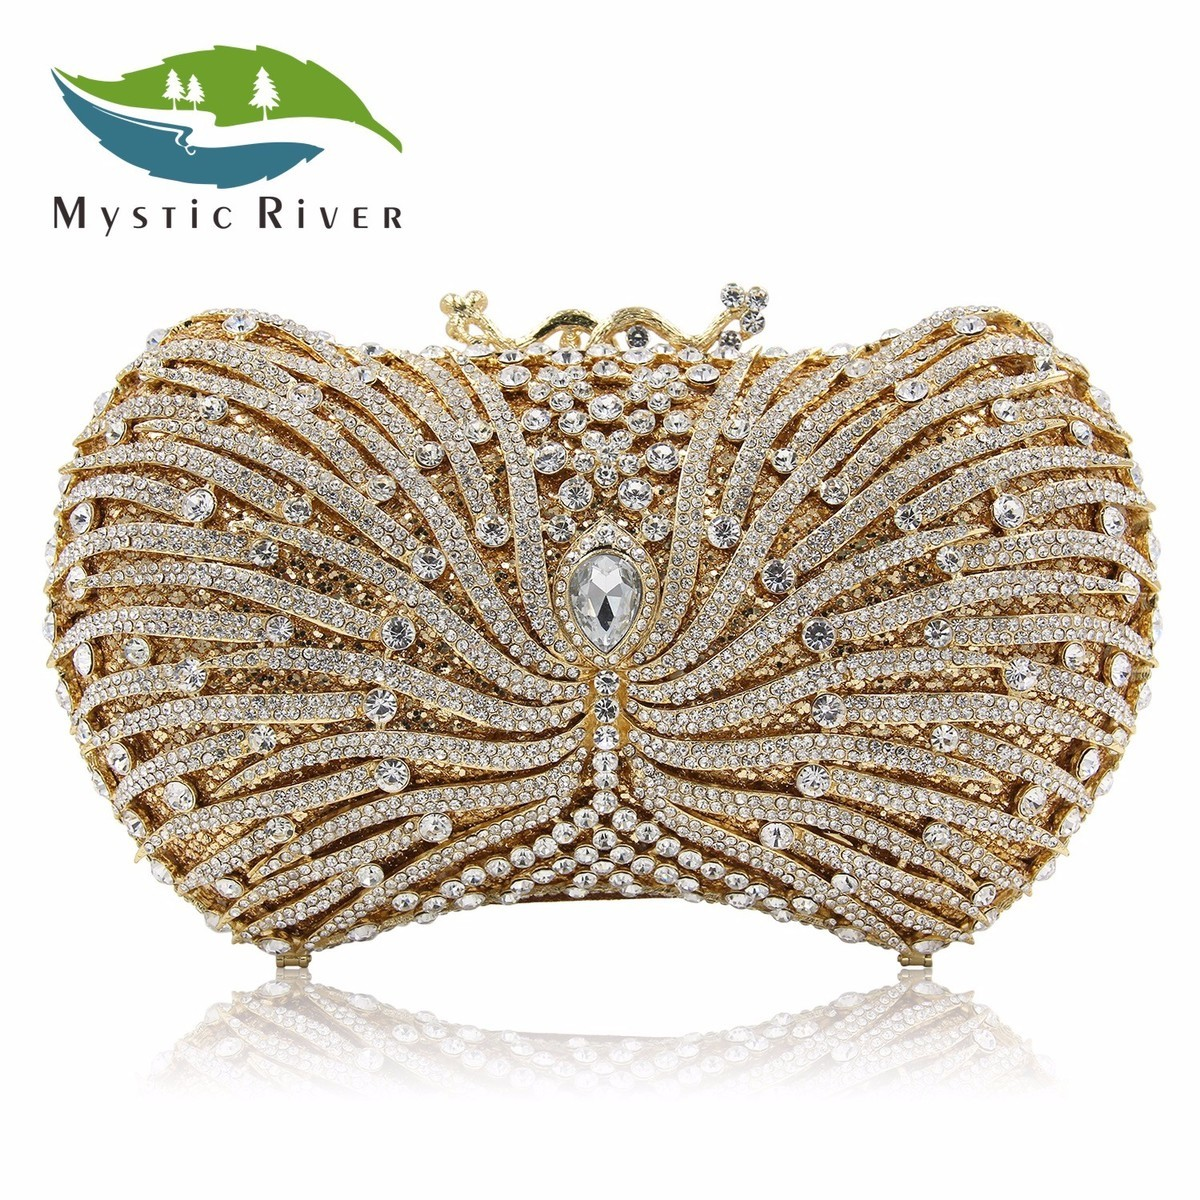 Mystic River New Women Evening bags Luxury Diamond Handbag Crystal Clutches Mini Party Wedding Purse Red Chain as16 9 rose top fashion luxury diamond african handbag purse for party wedding